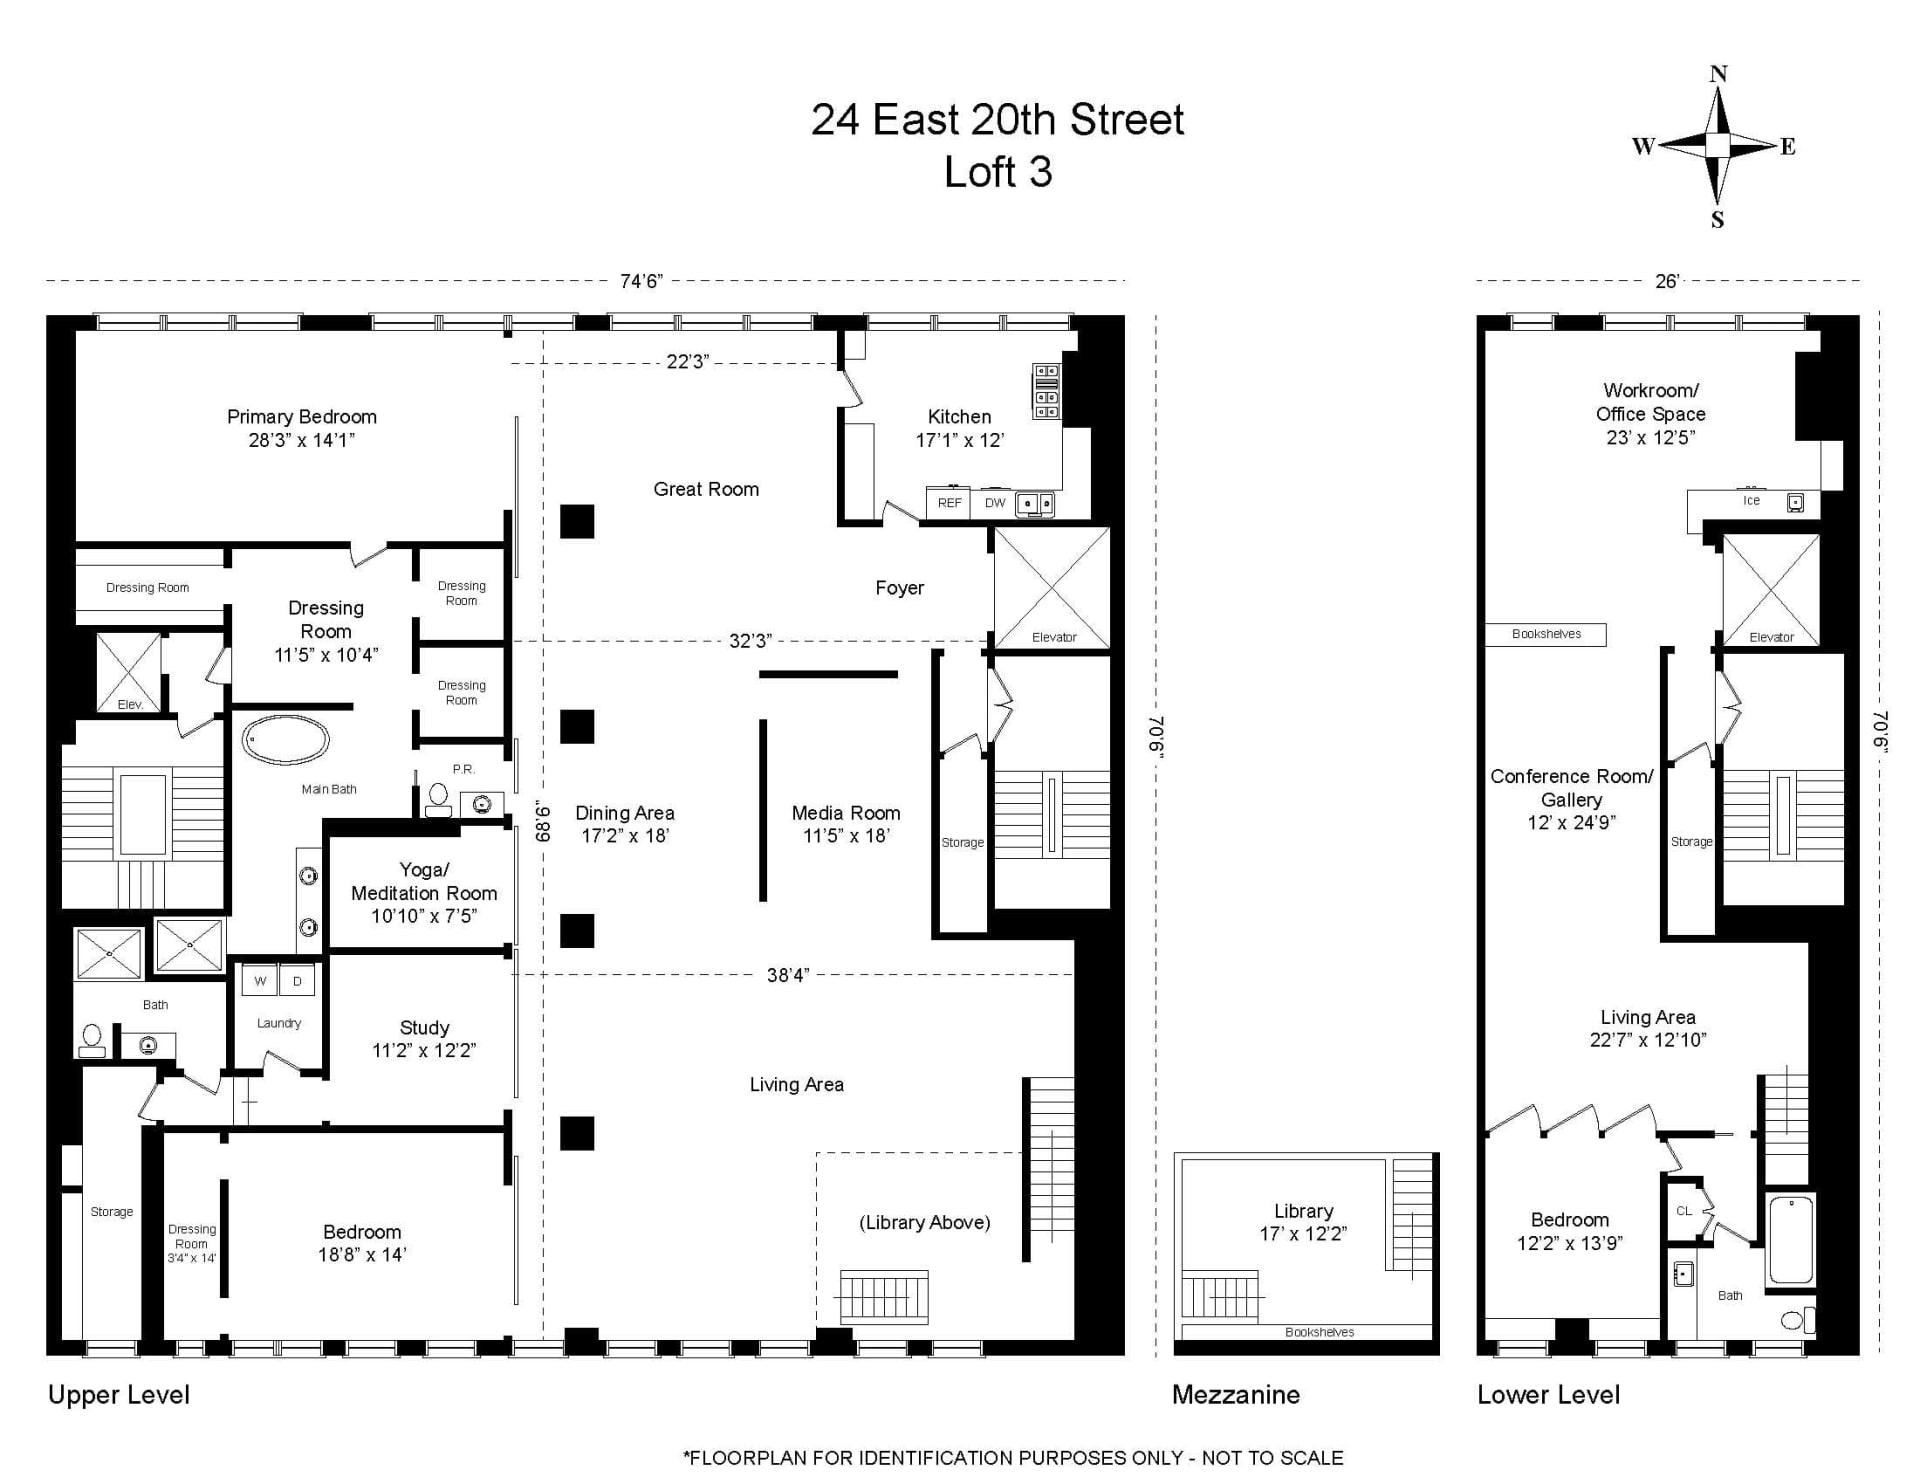 24 East 20th Street, Loft 3